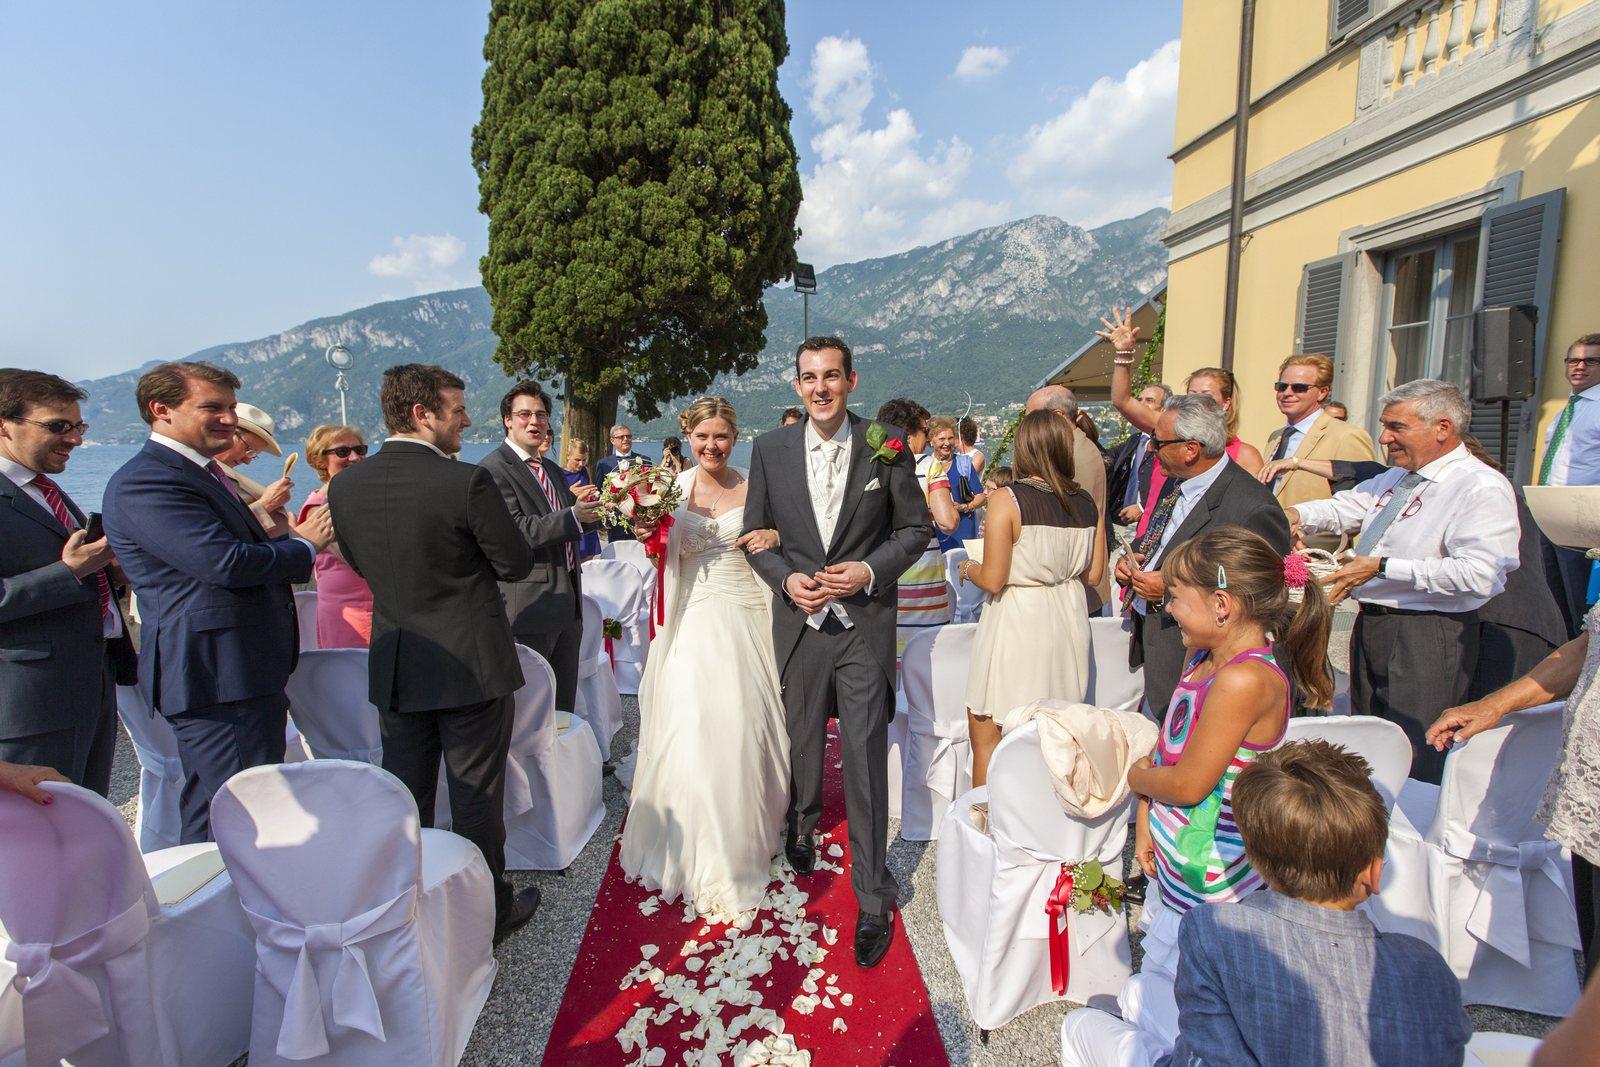 wedding blessing in villa corte del lago